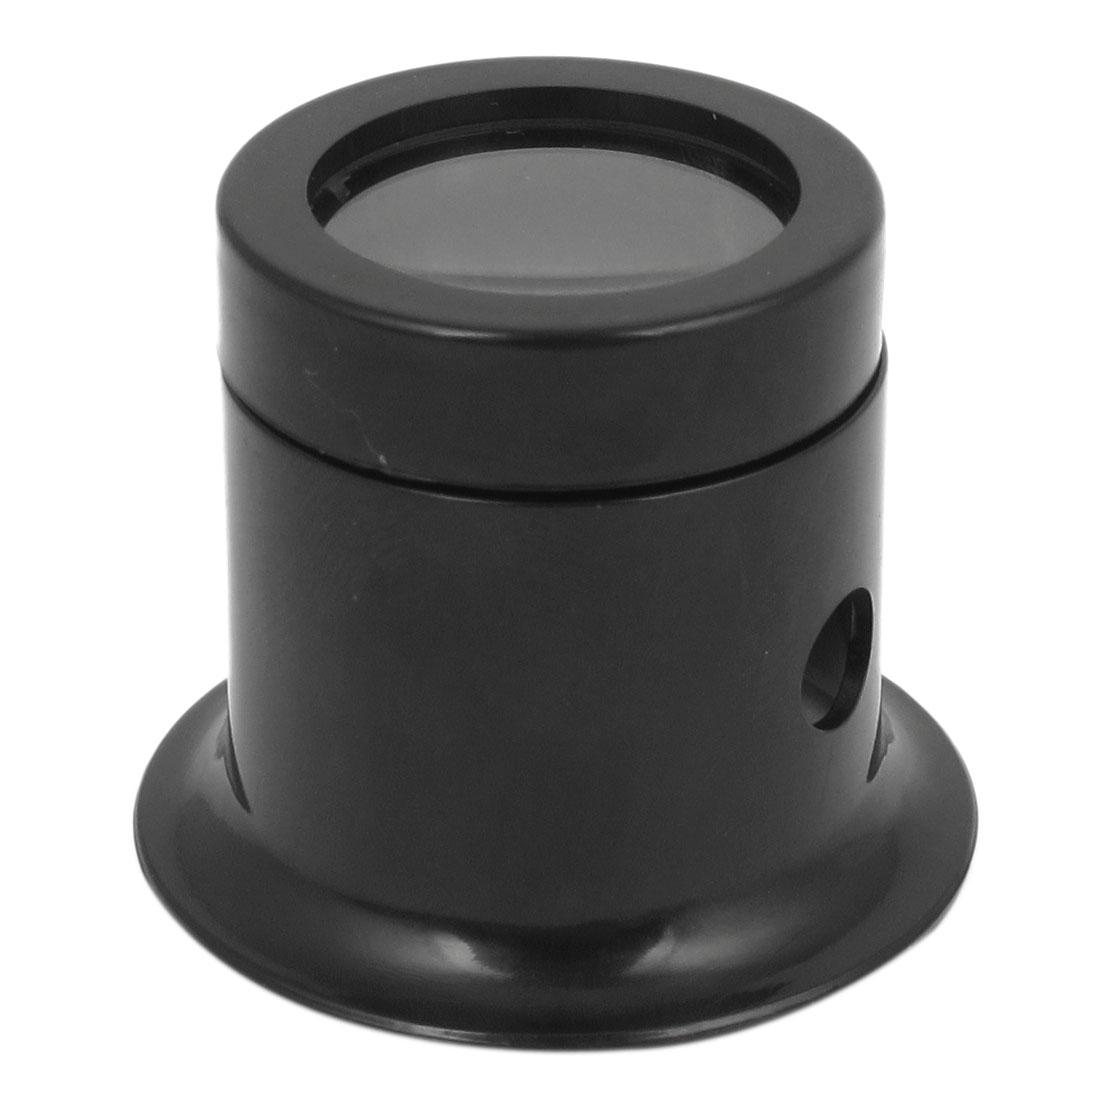 Black Plastic Magnifying Glass Loupe Len 20mm Headband Watch Repair Magnifier 5X